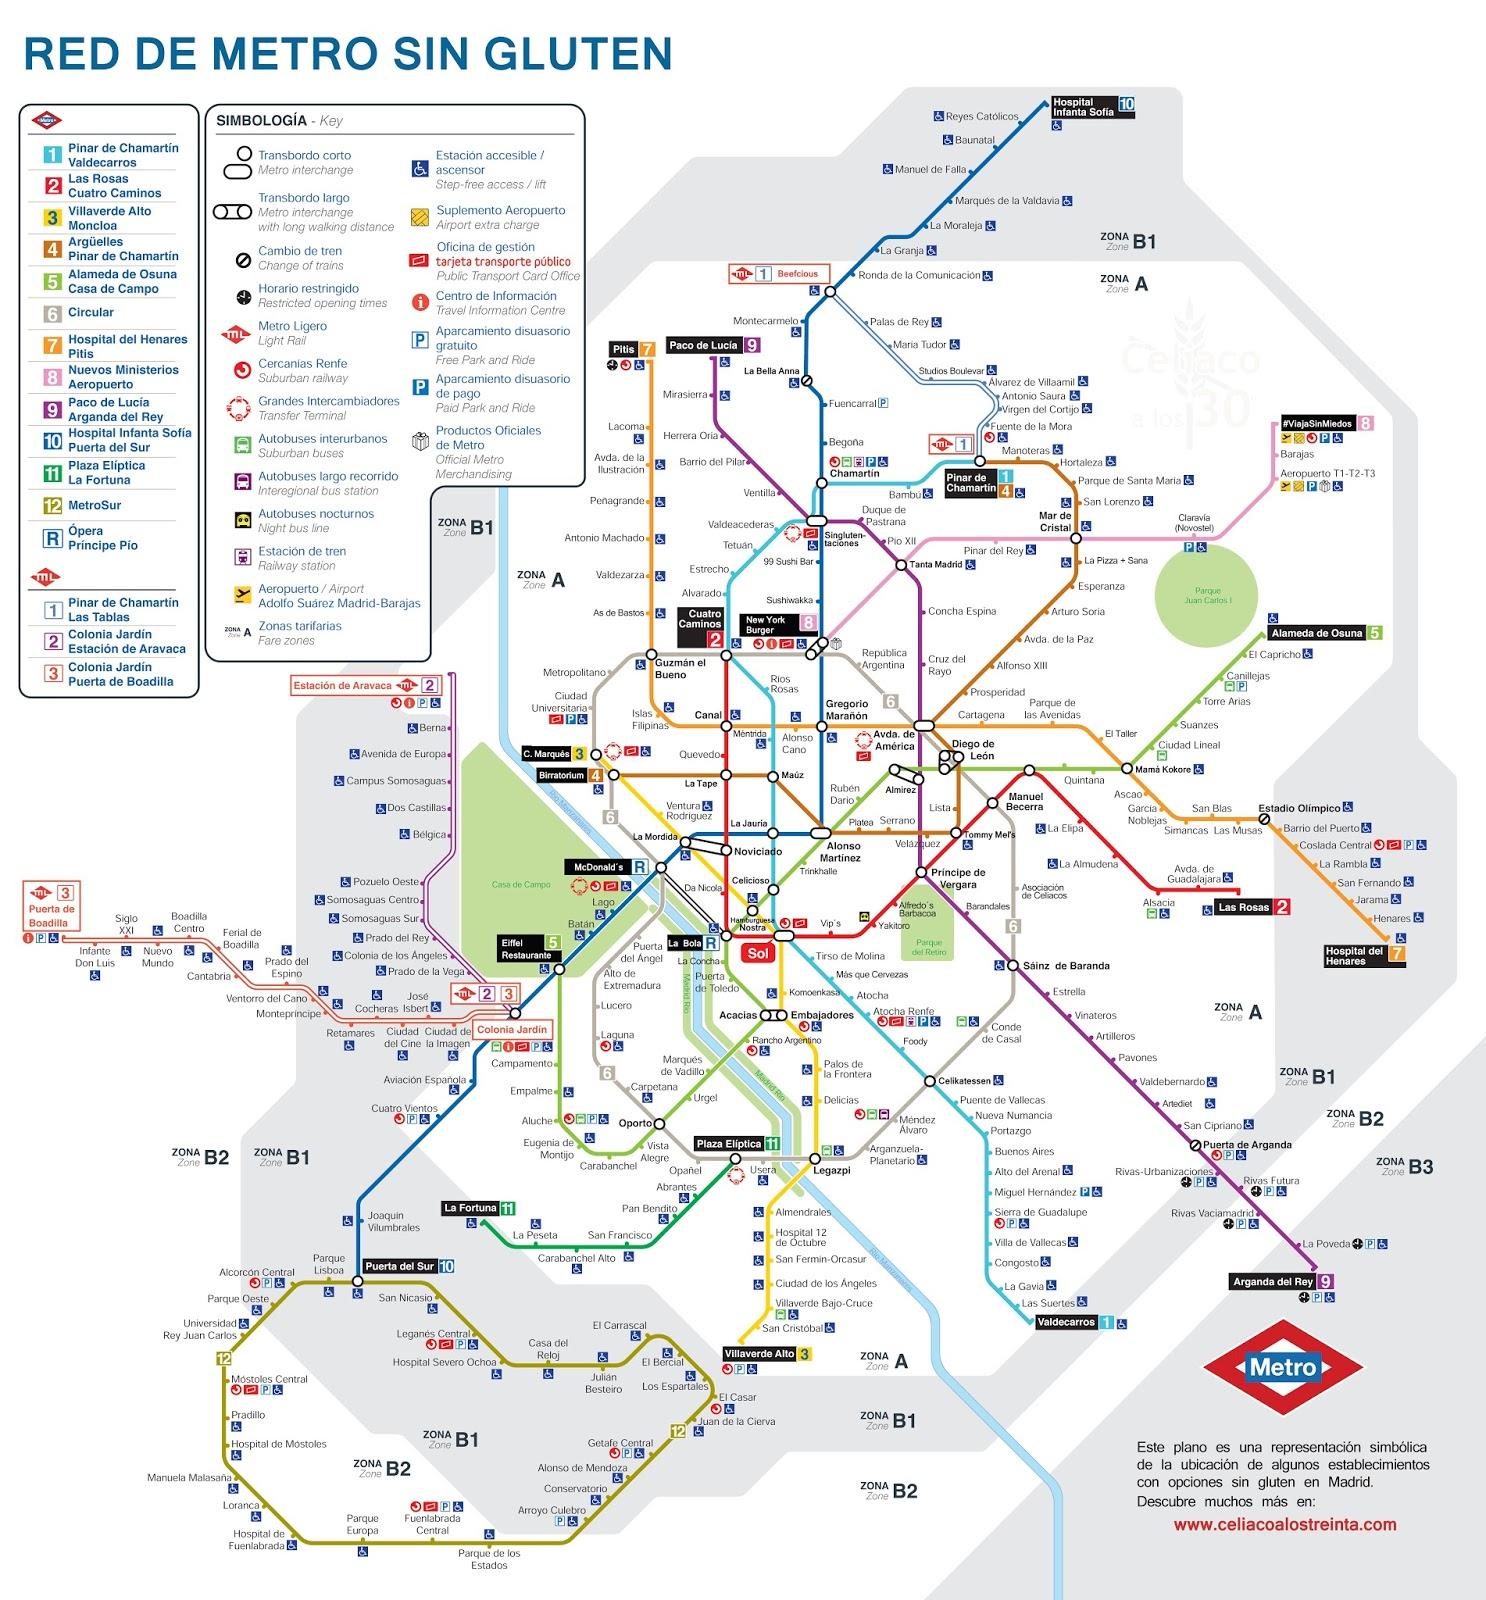 Metro de Madrid Sin Gluten